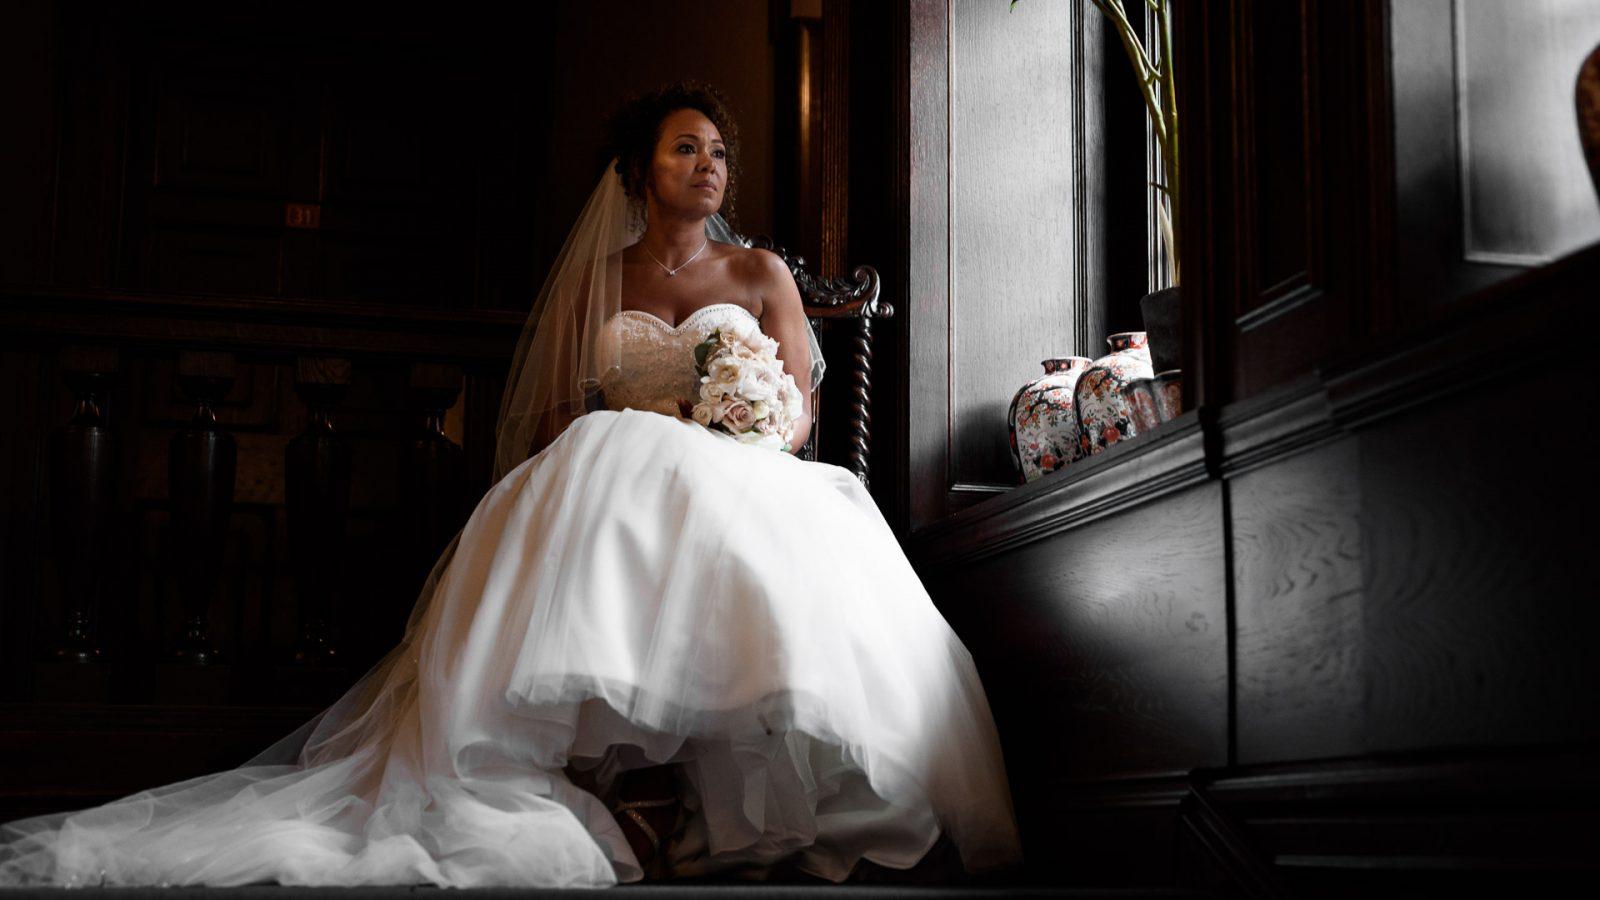 best-wedding-photos-2017-kimberley-and-joseph-bride-wedding-ready